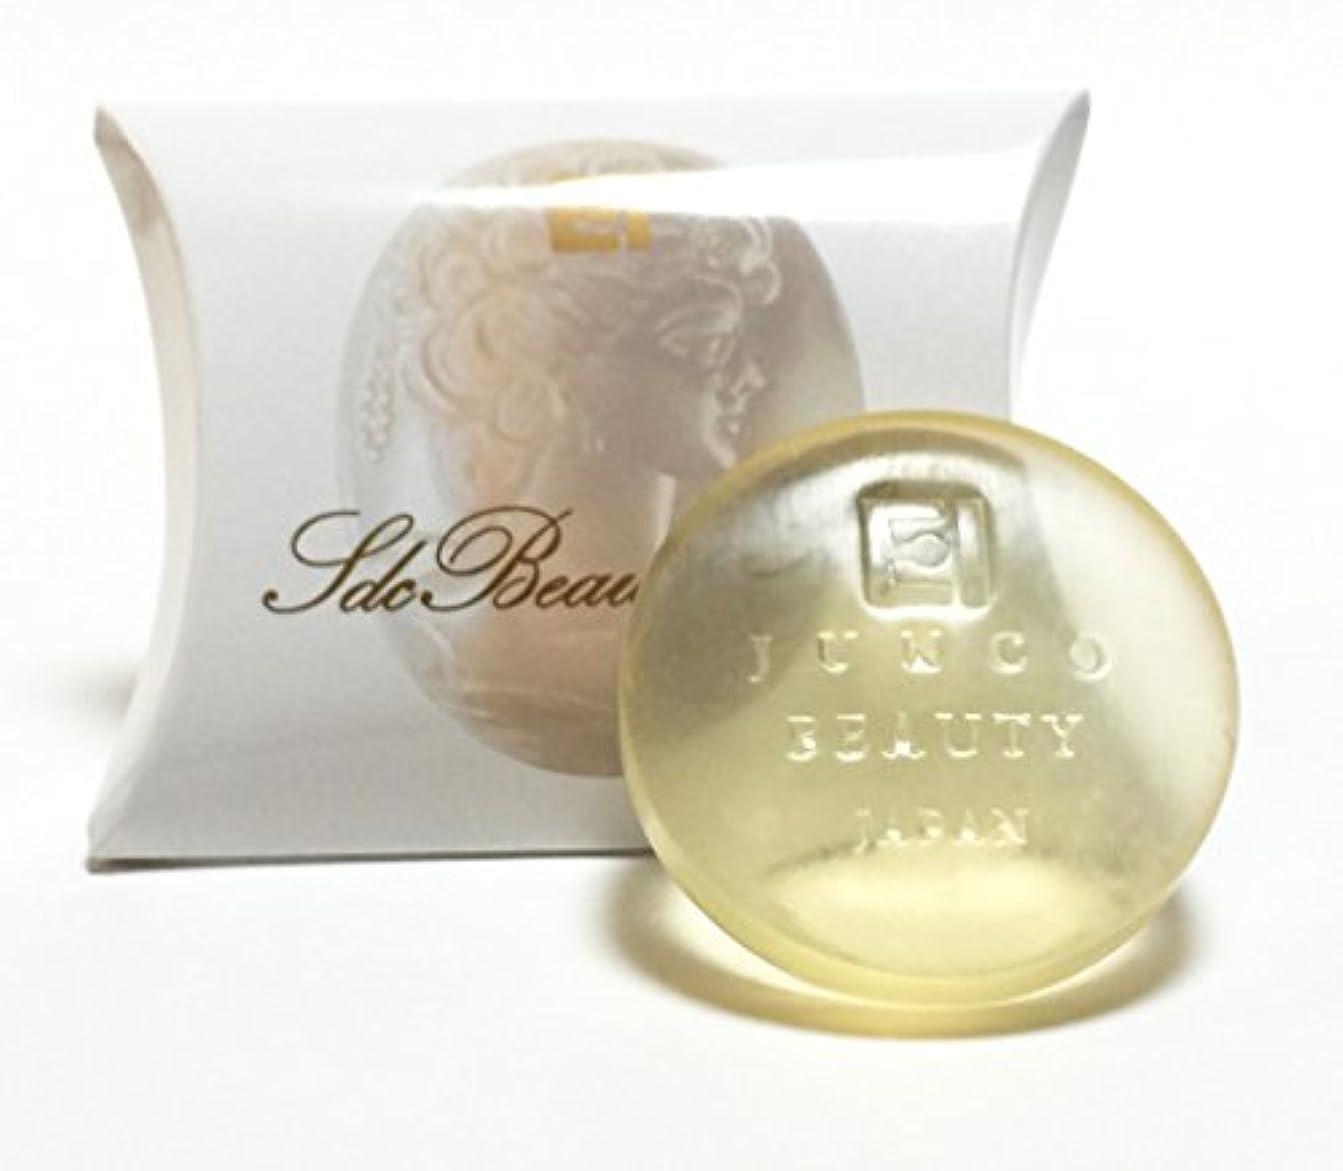 EI SDC BEAUTY SOAP(20g)